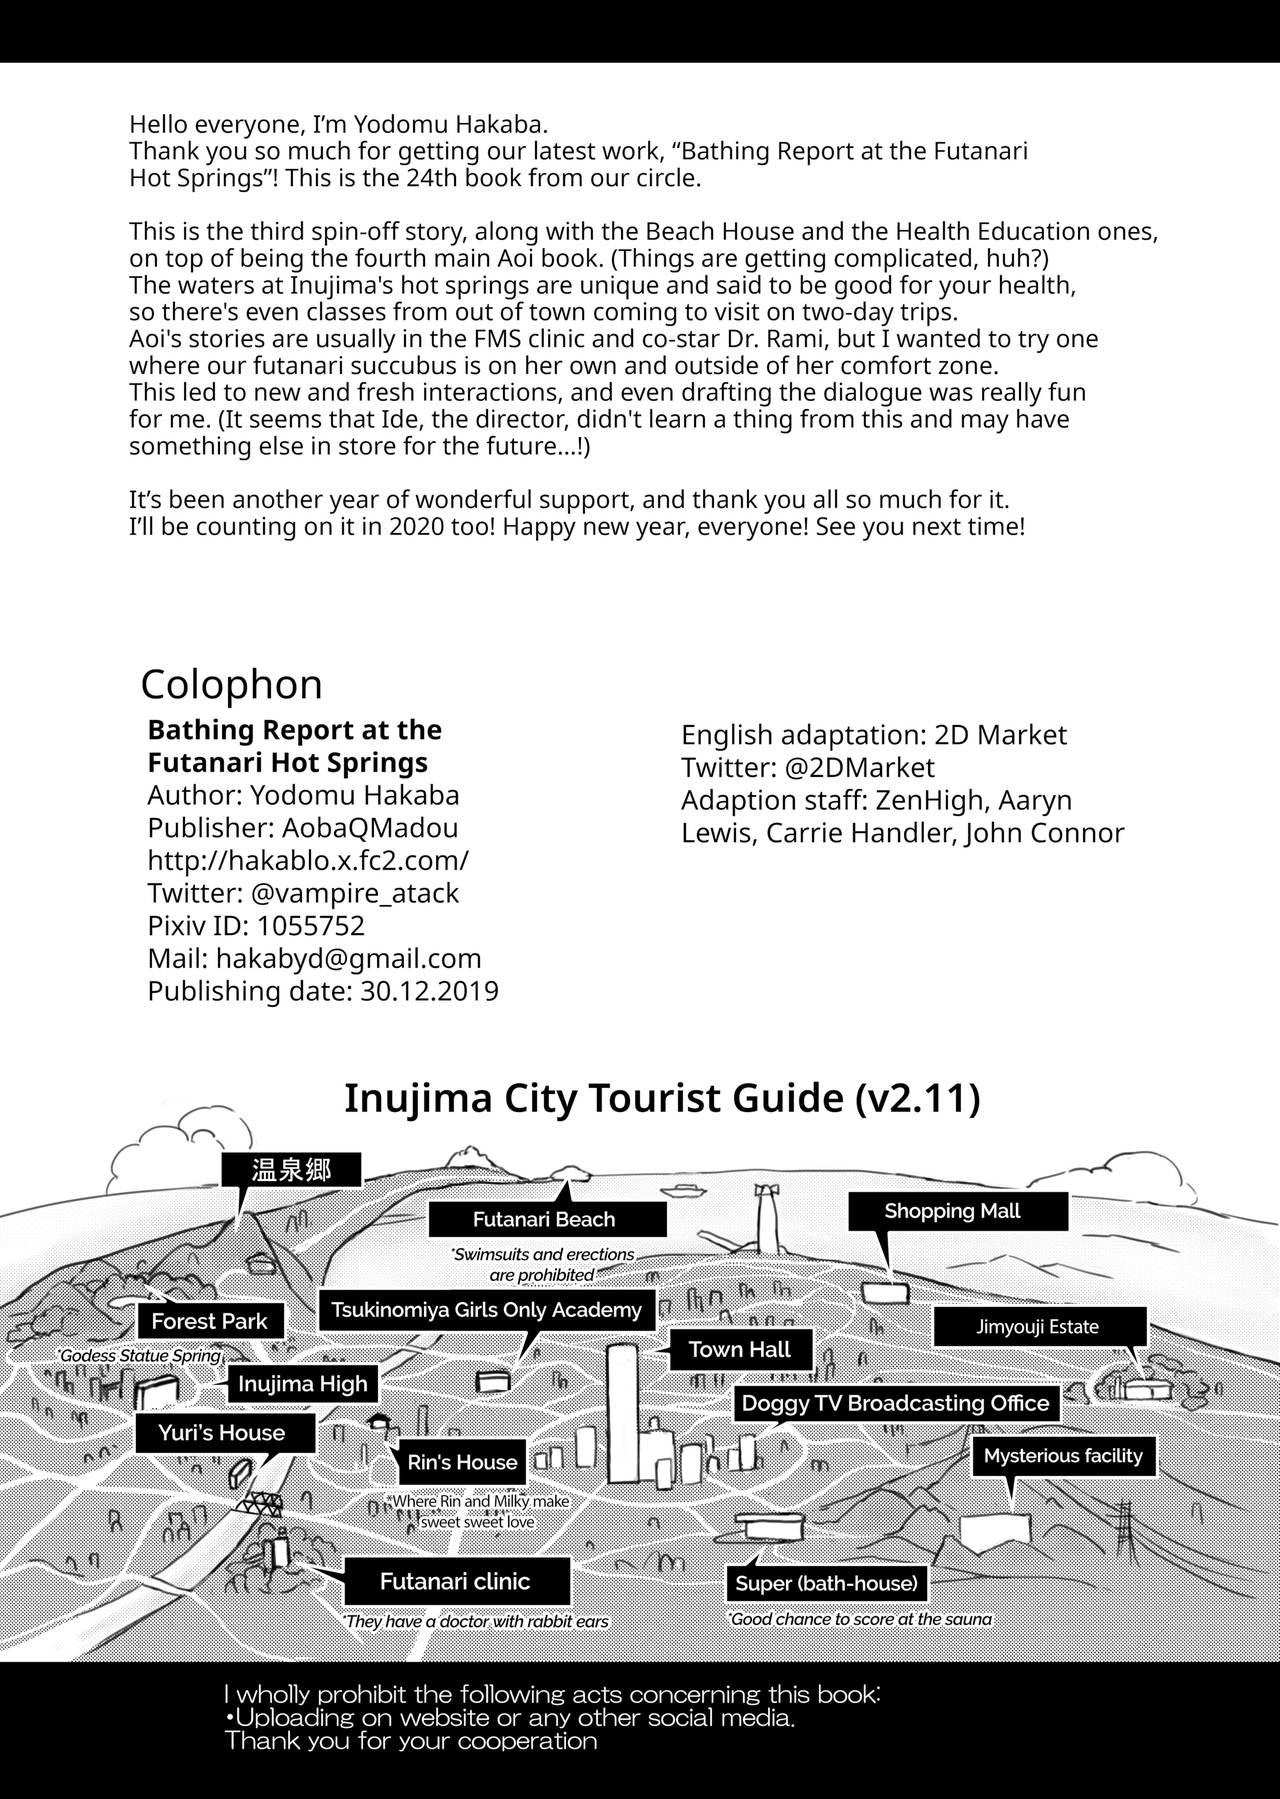 Futanari Onsen Bangumi no Nyuuyoku Reporter ★ | Bathing Report at the Futanari Hot Springs 28